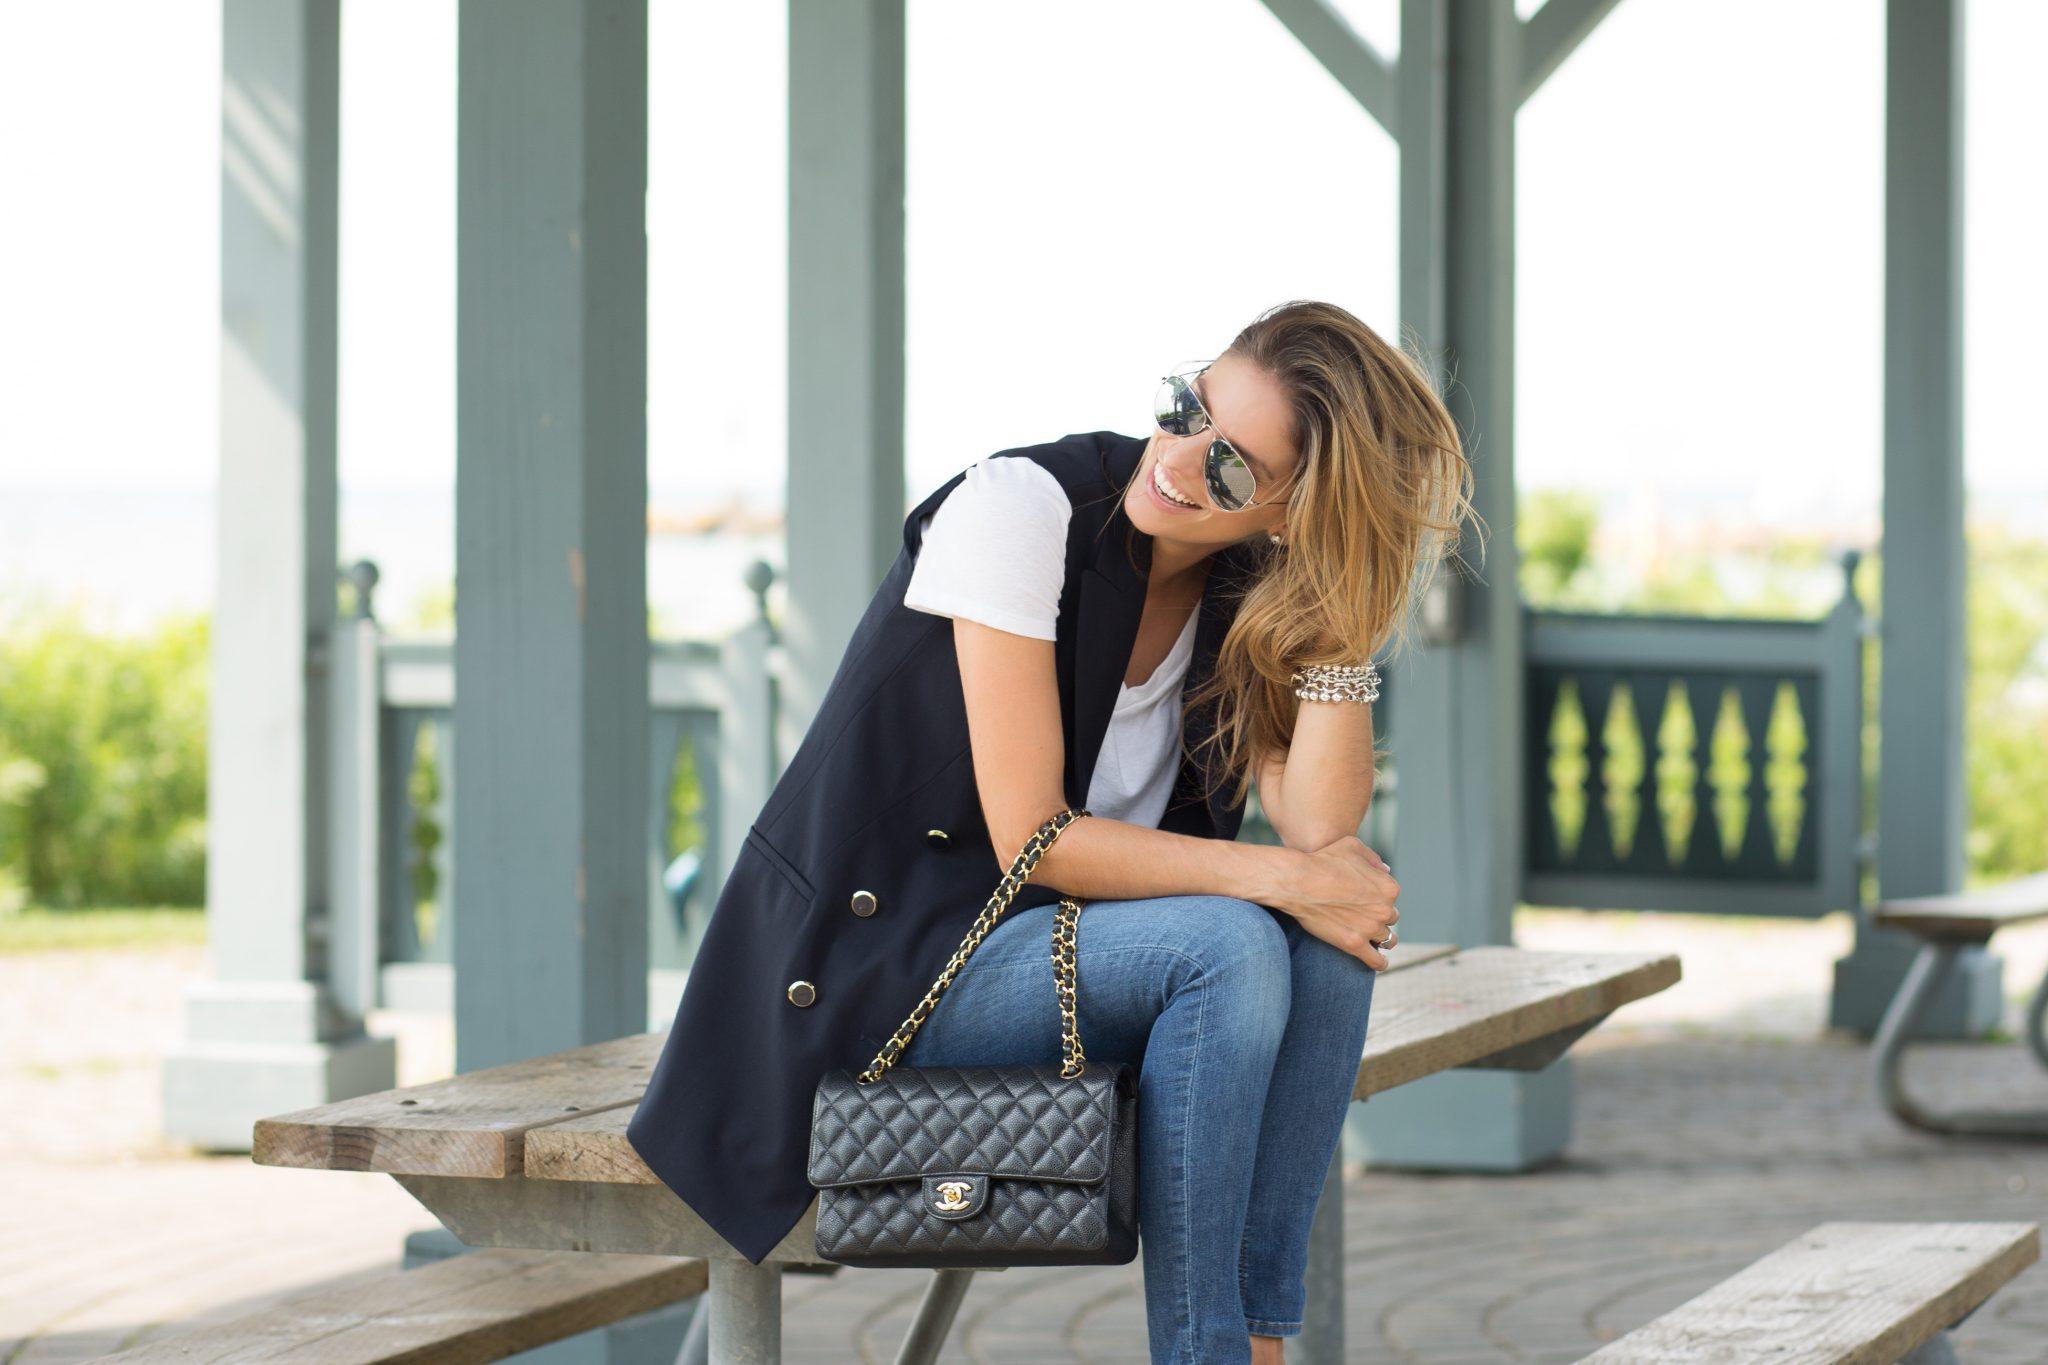 Military blazer vest from Zara, white t-shirt from Target, J.Brand skinny jeans, Chanel medium flap bag, grey loafers